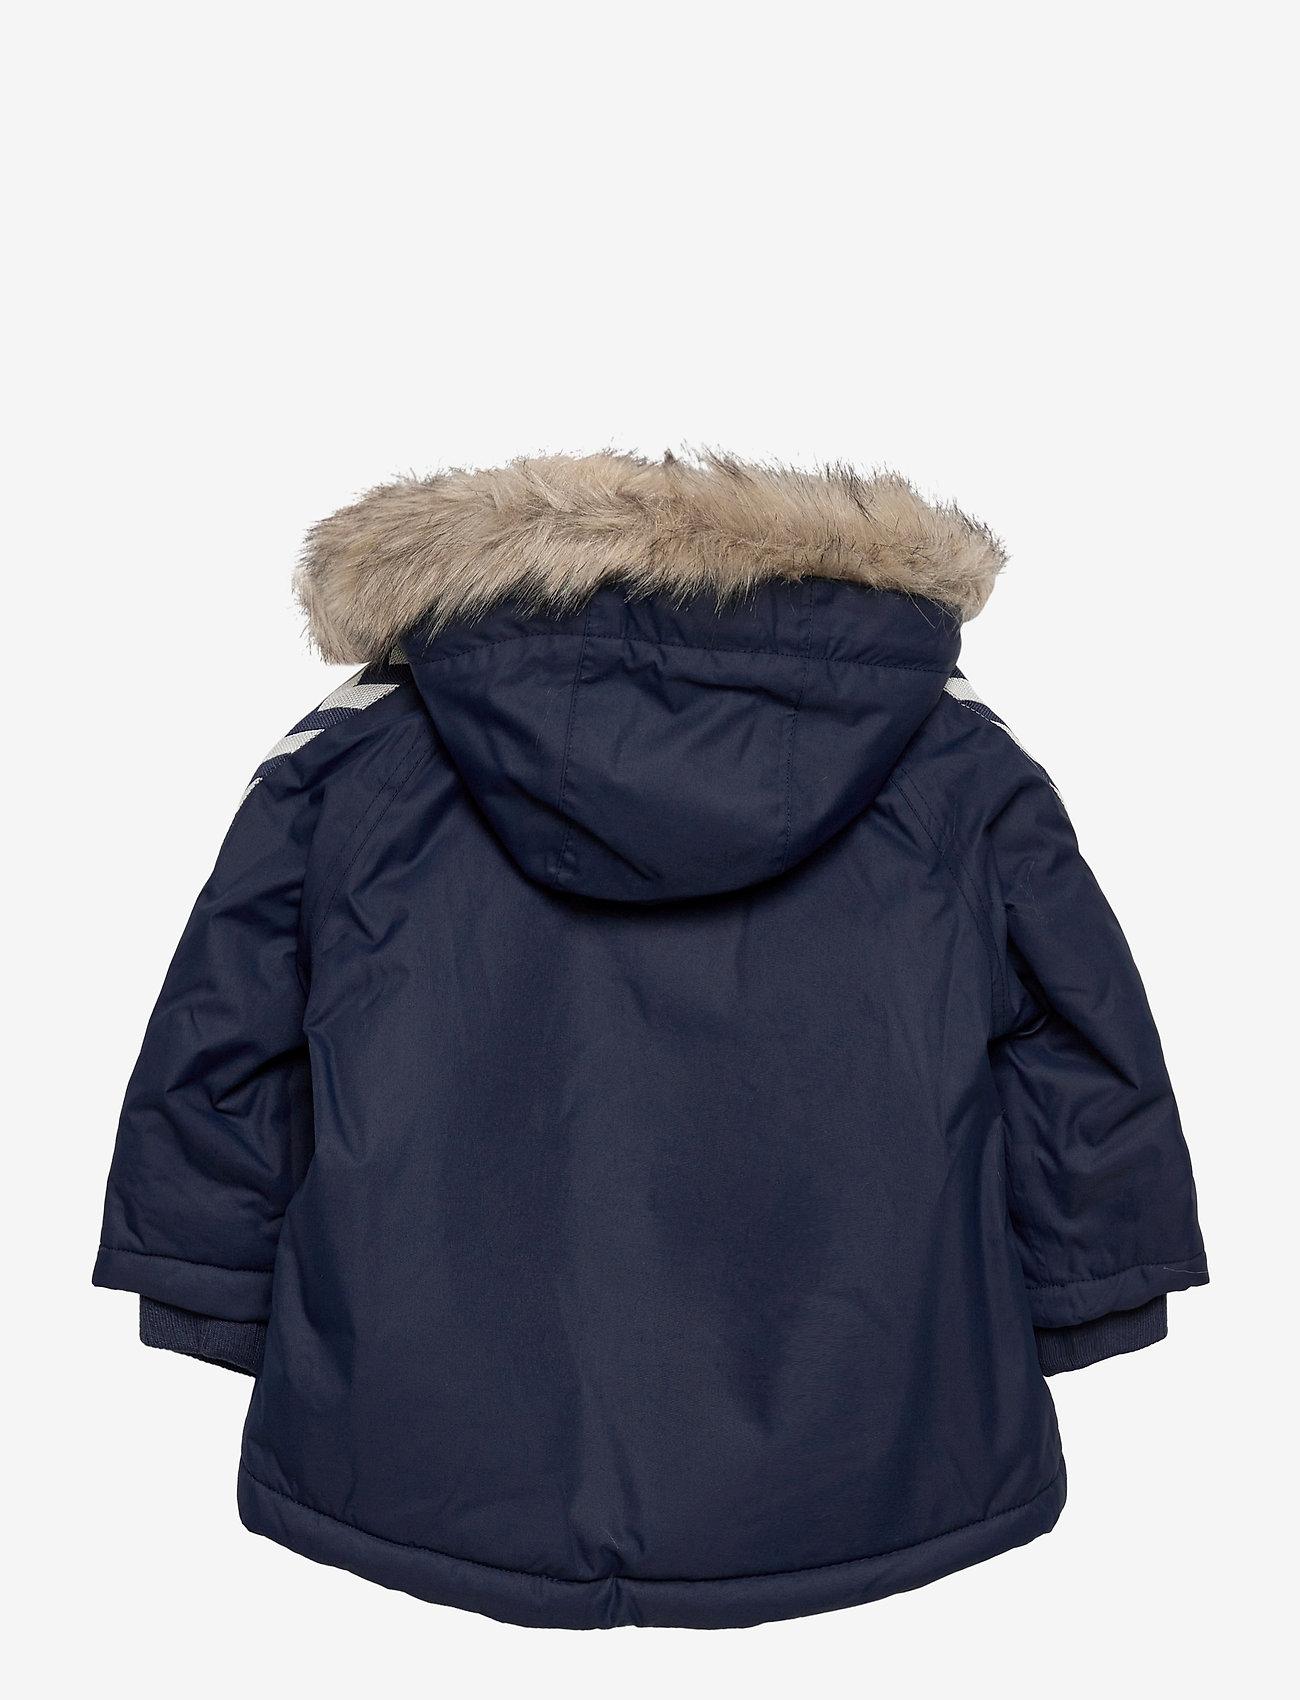 Hummel - hmlJESSIE JACKET - insulated jackets - black iris - 1